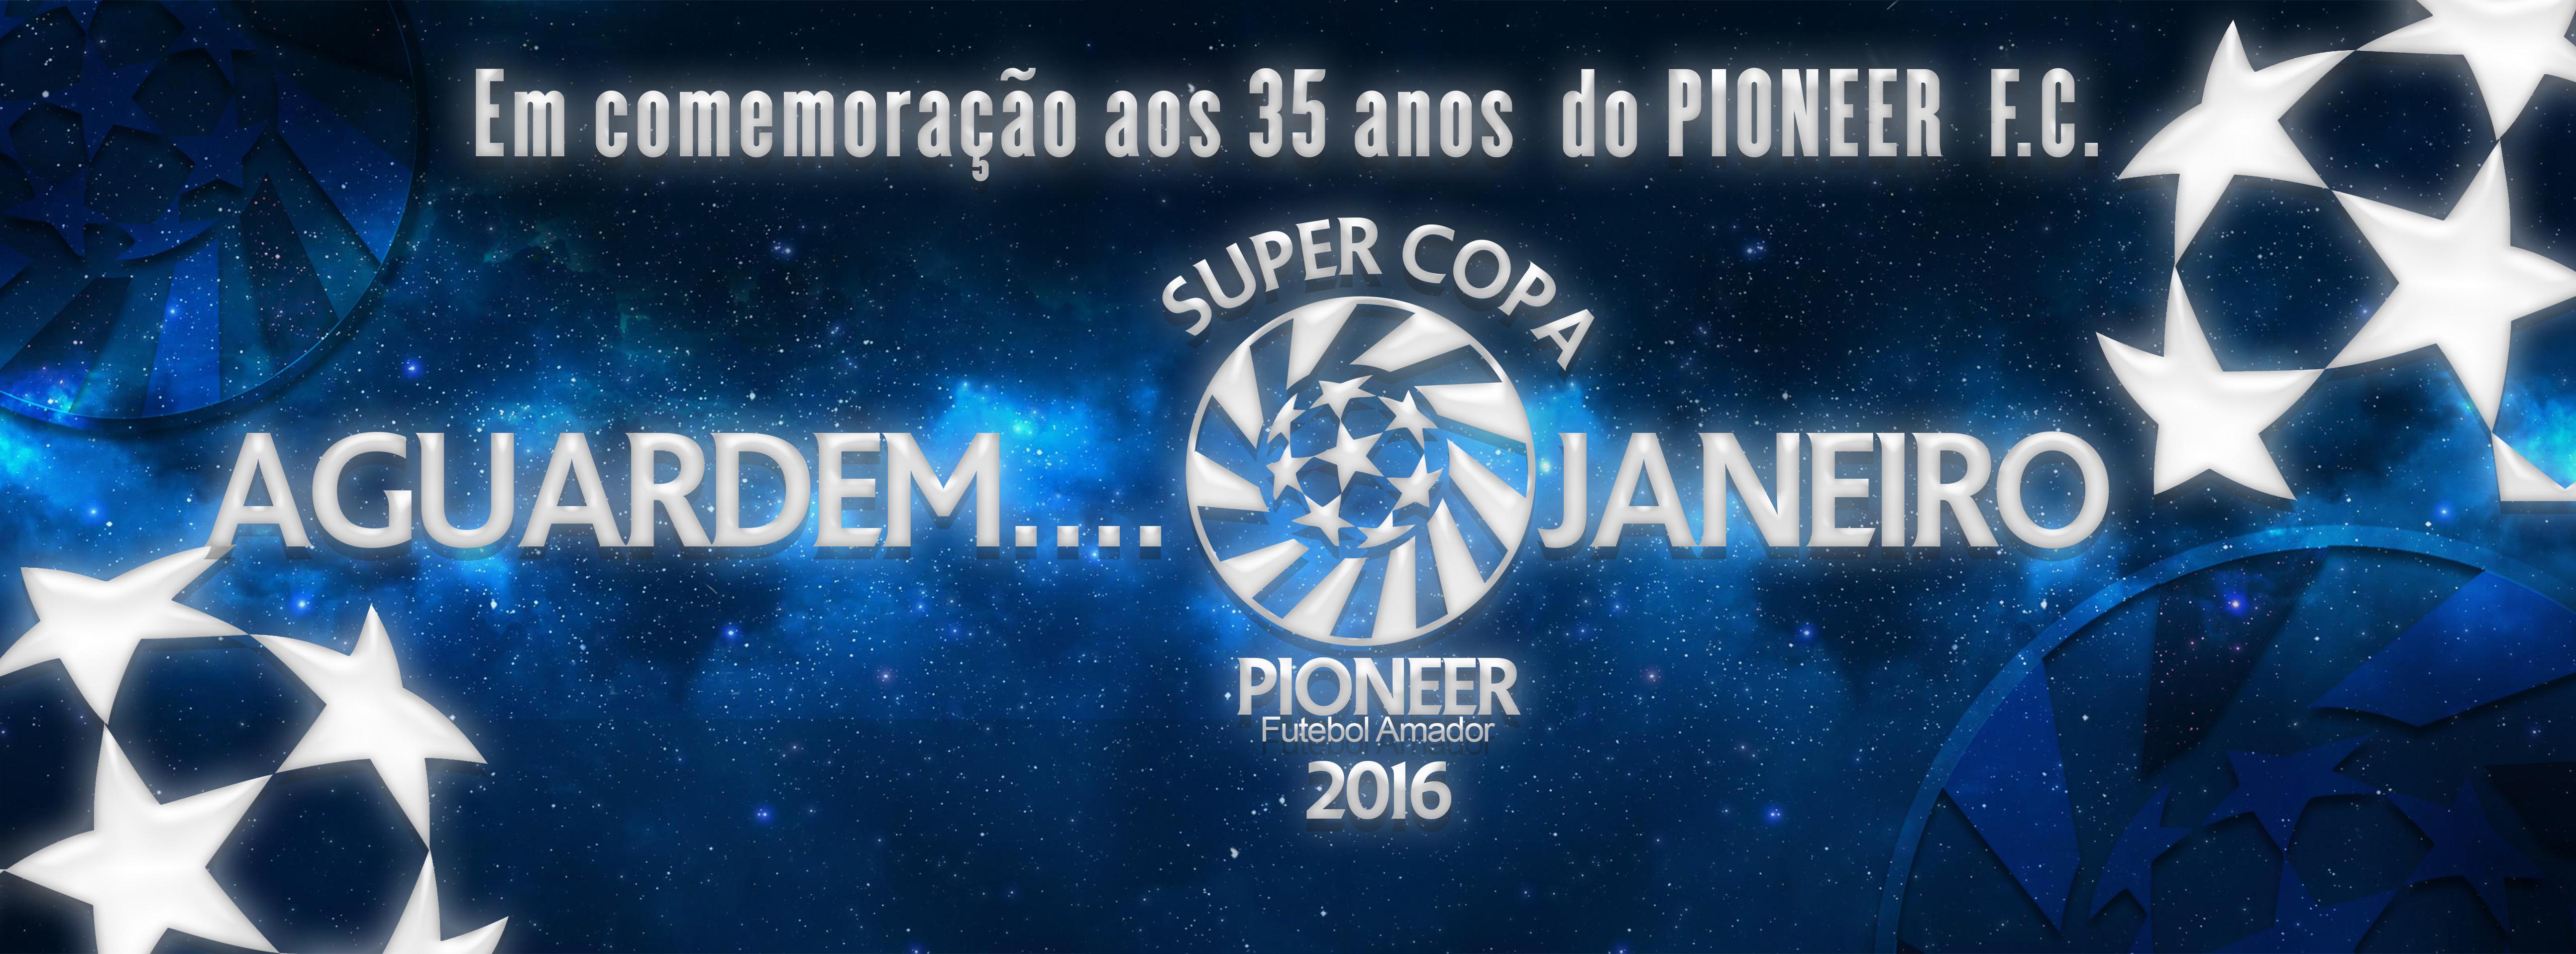 Super copa pioneer vai agitar s o paulo em 2016 futebol for Super copo